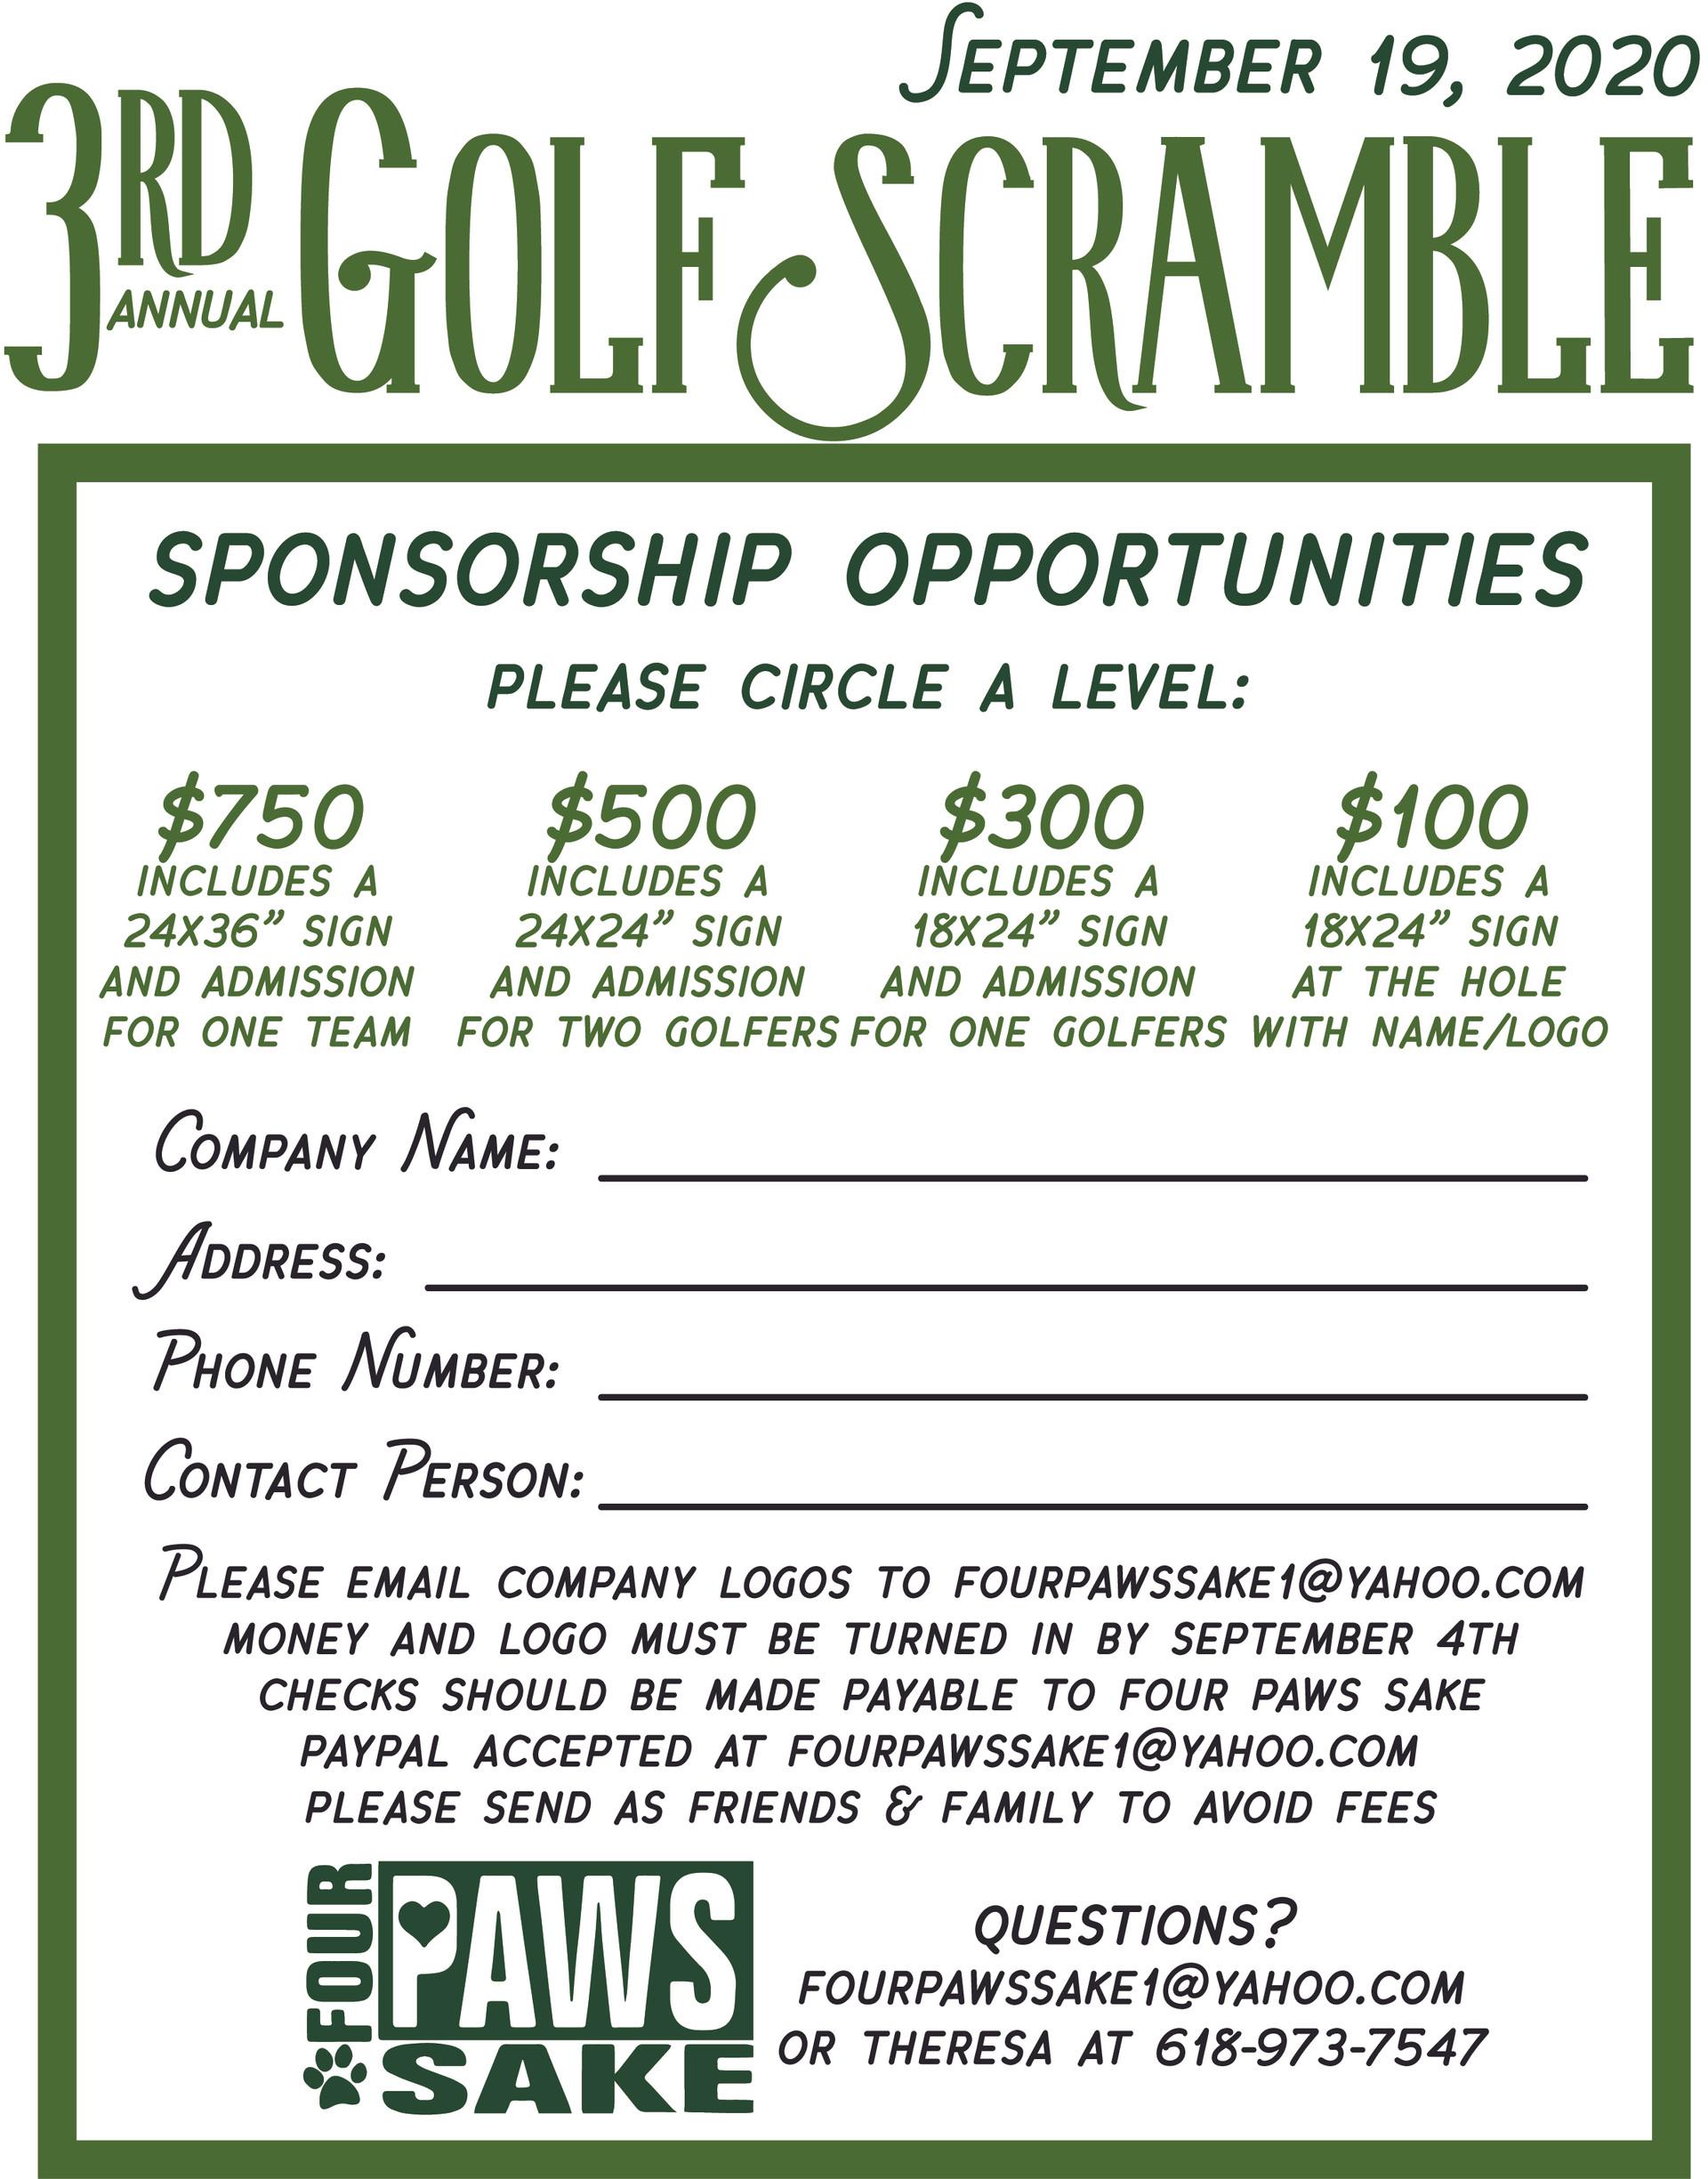 golfscramble_sponsorship2020.jpg